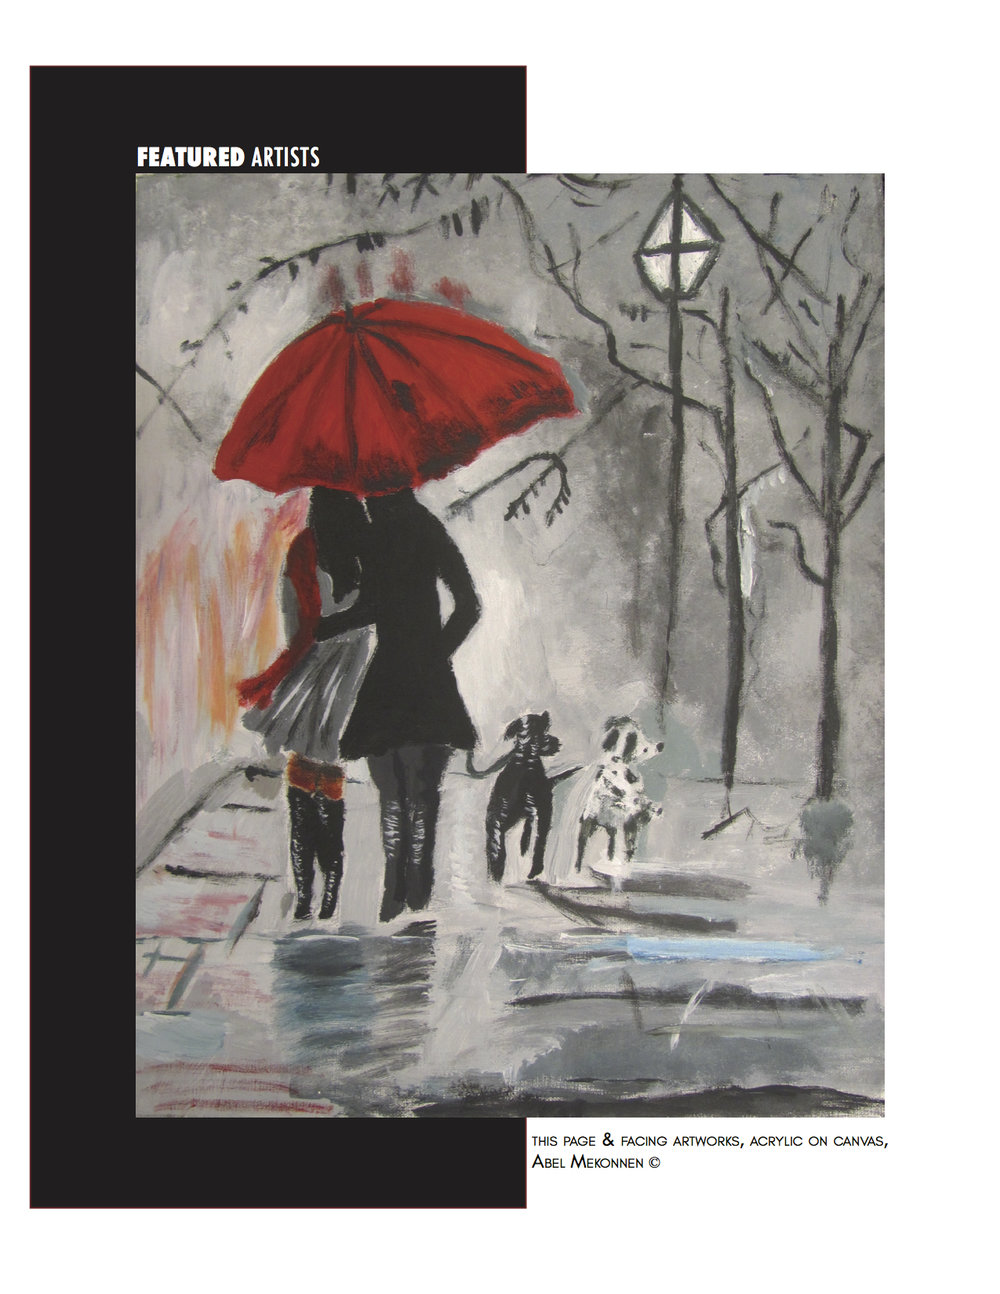 Artis 3 Abe umbrella.jpg